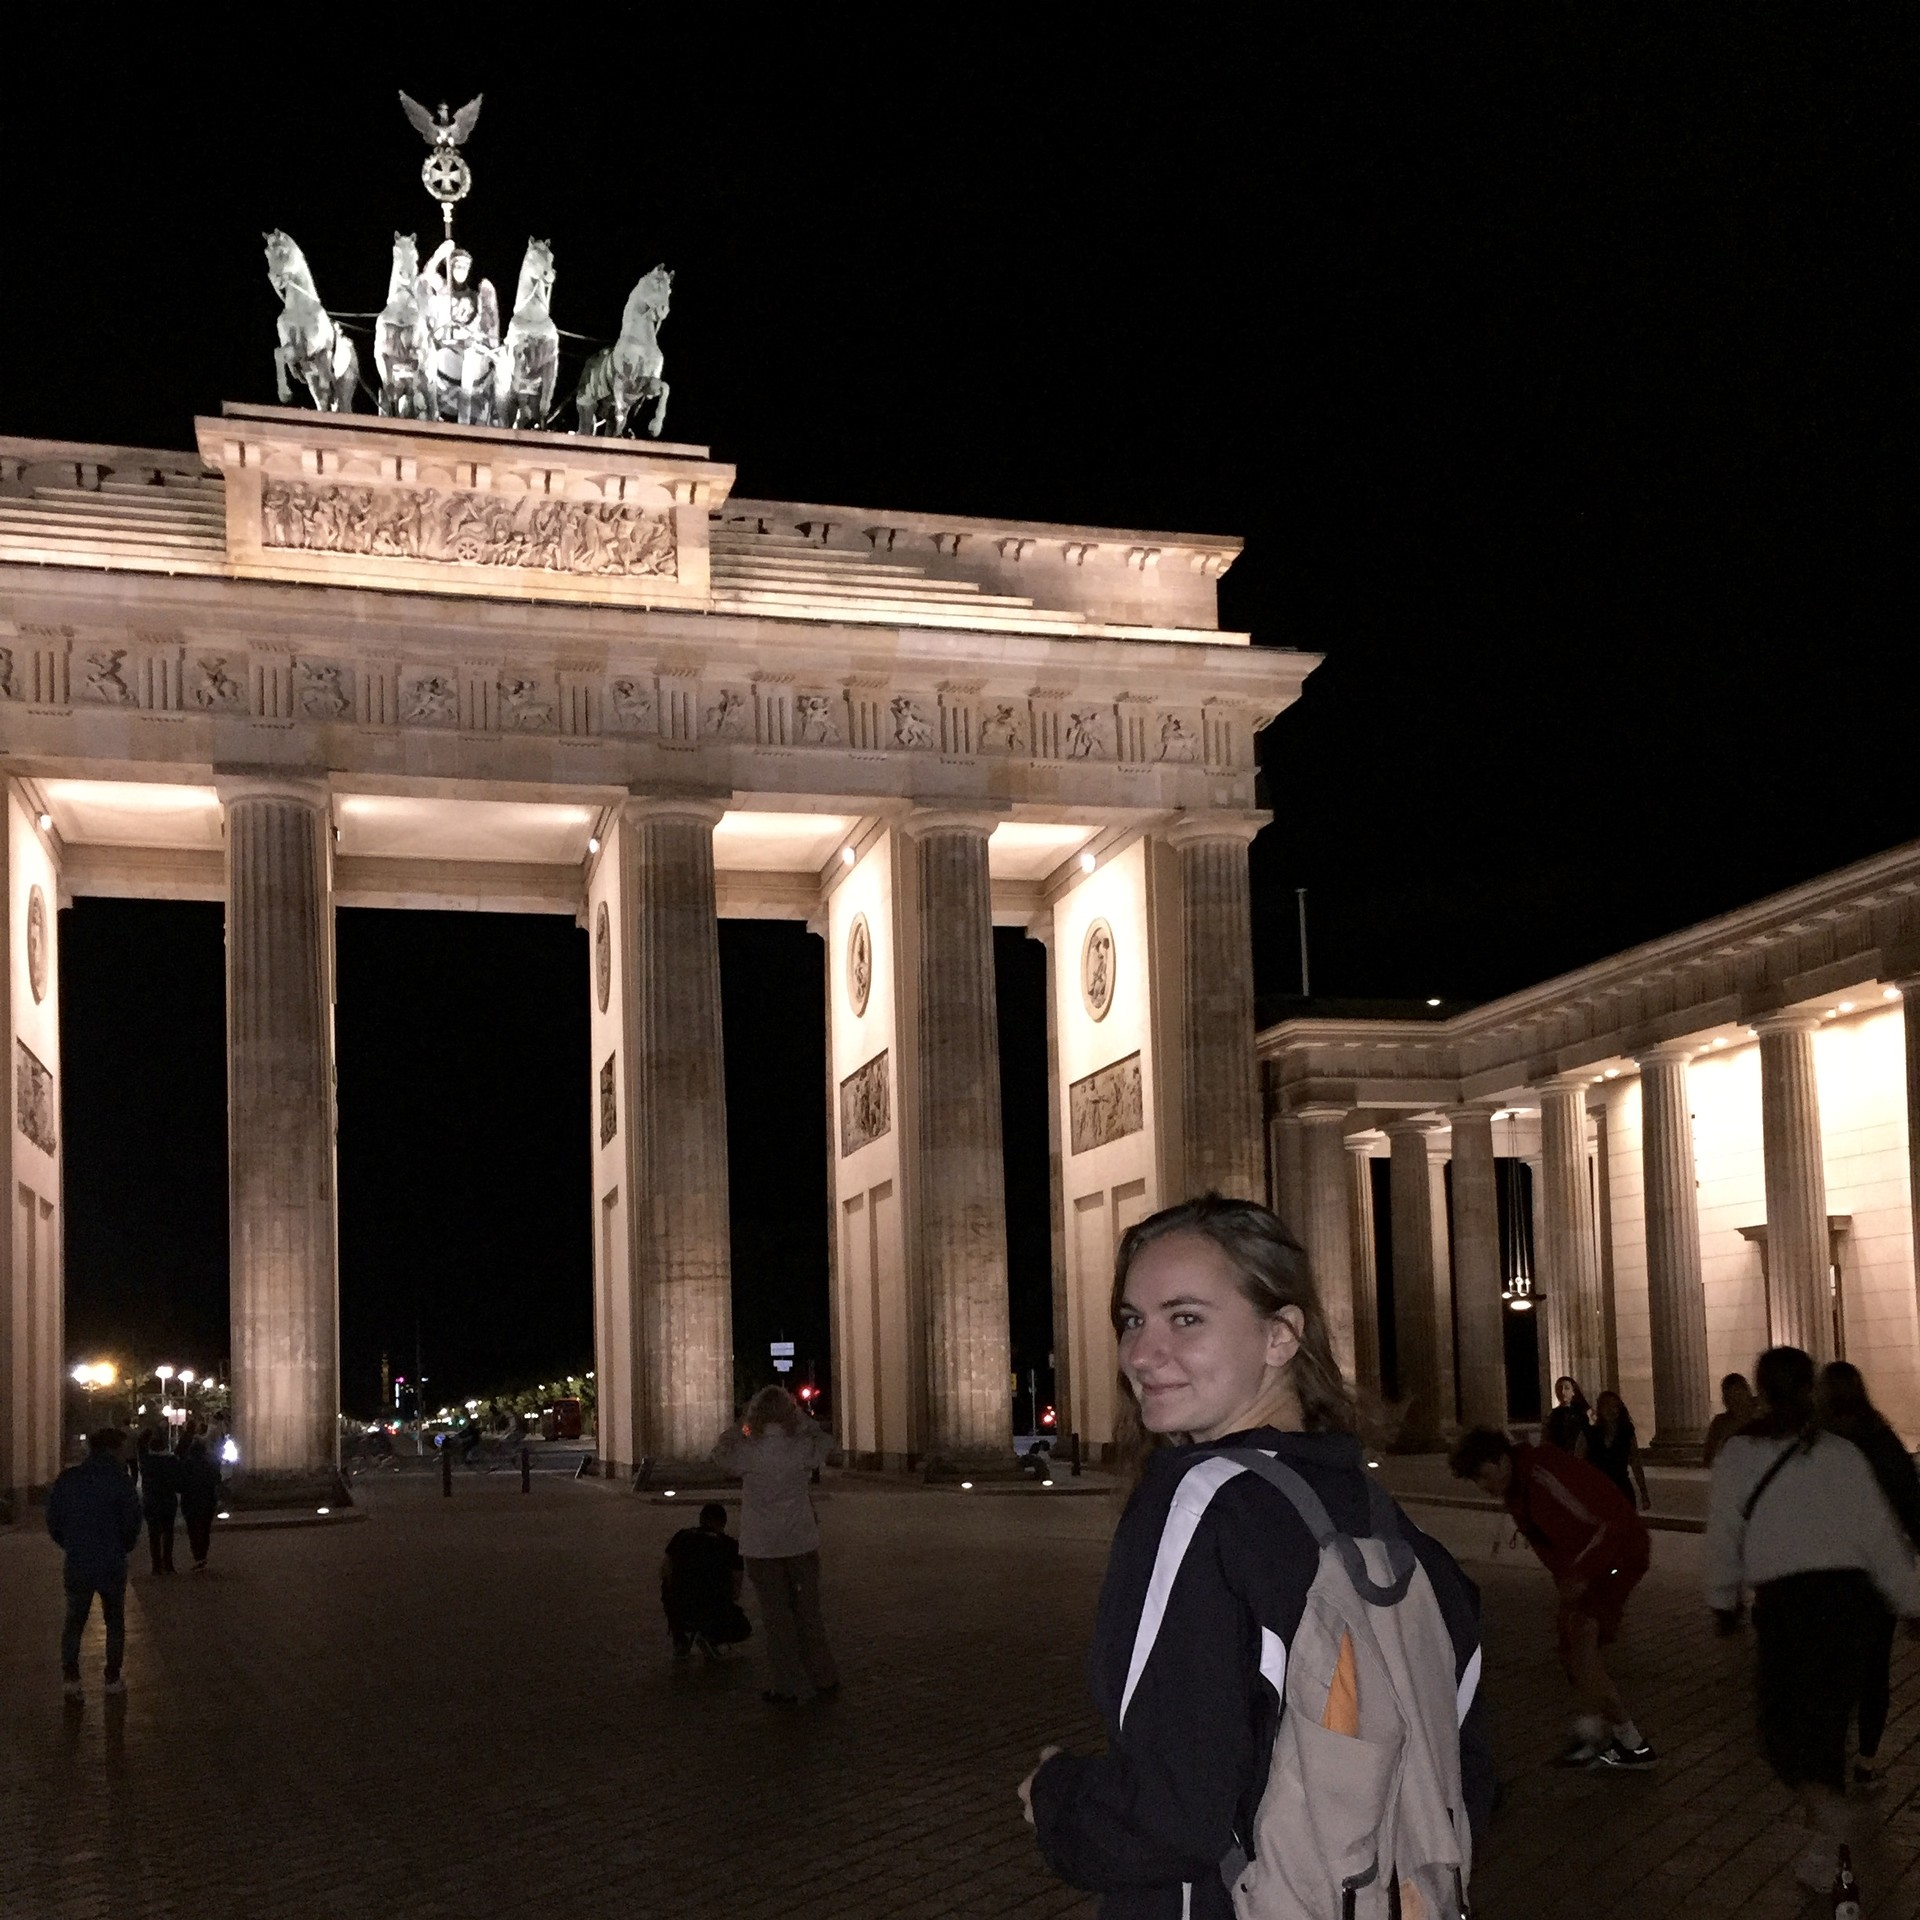 10-things-berlin-summer-213c1b39a078d7bb